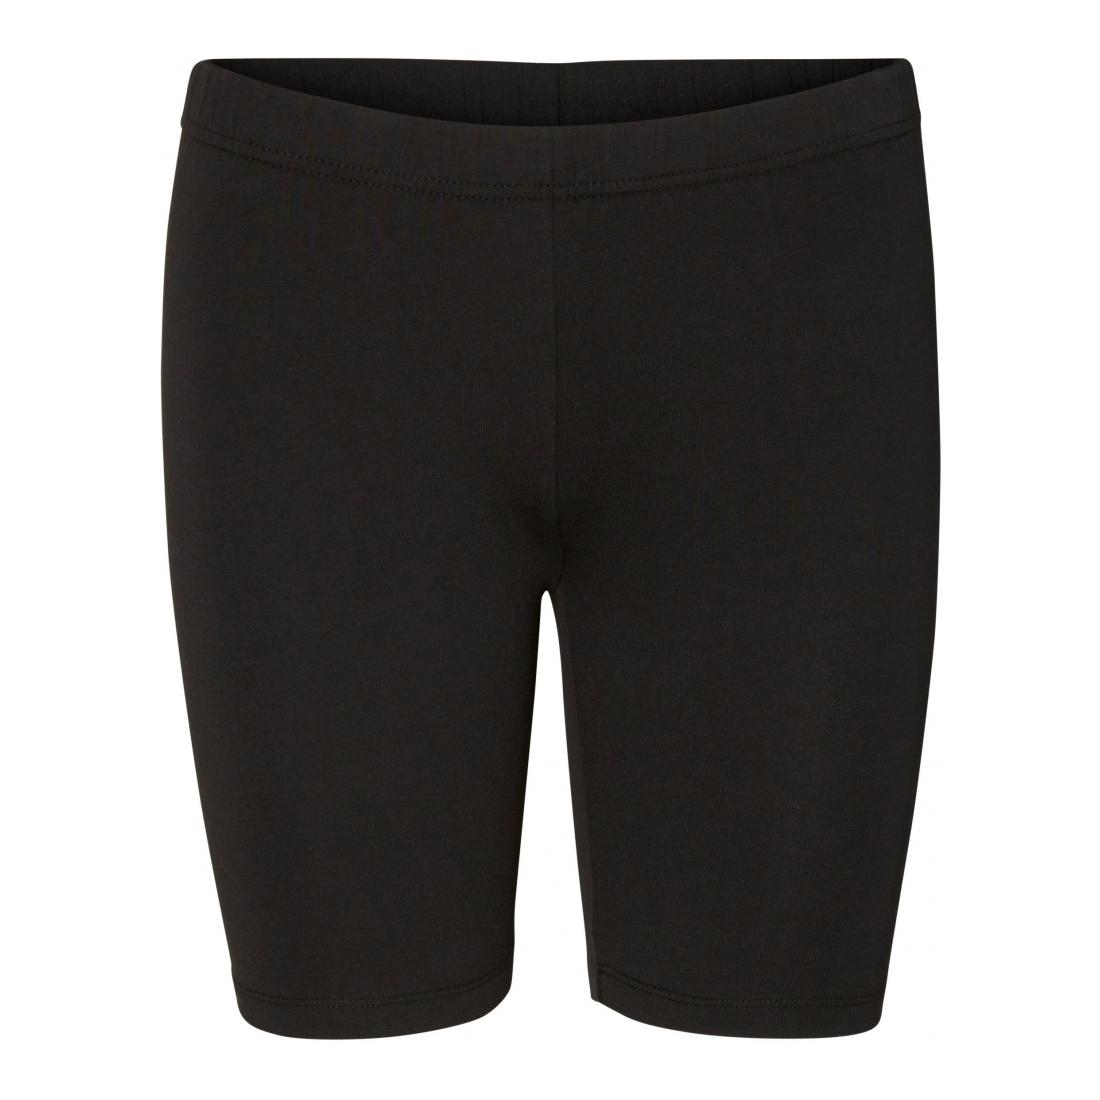 Vero Moda Bermuda/Shorts Damen VMMAXI BIKER SHORTS GA CO